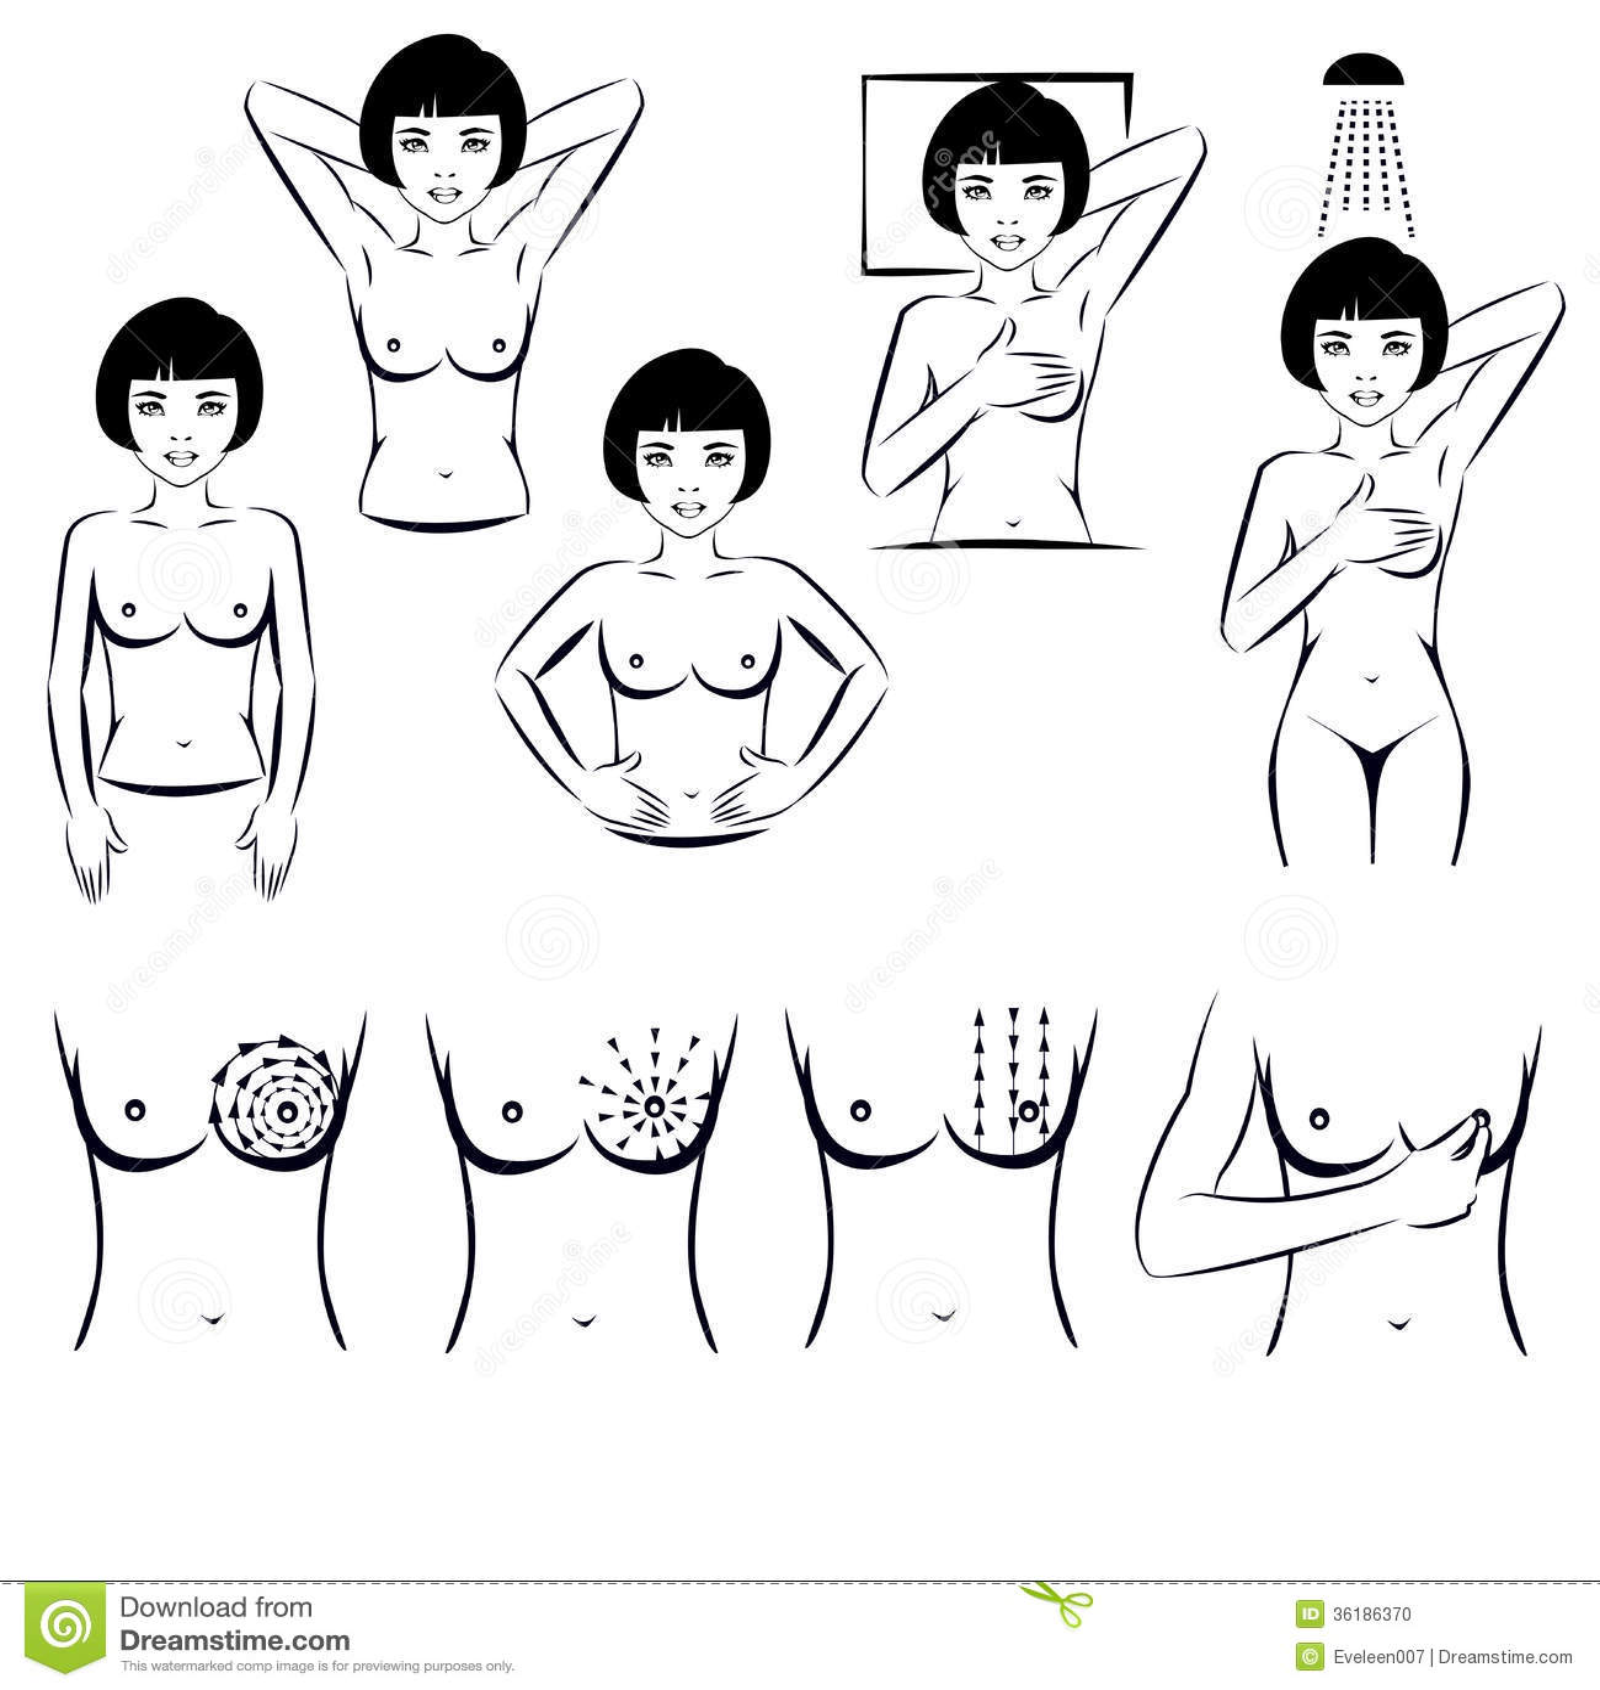 Should I Do a Breast Self-Exam? - KidsHealth